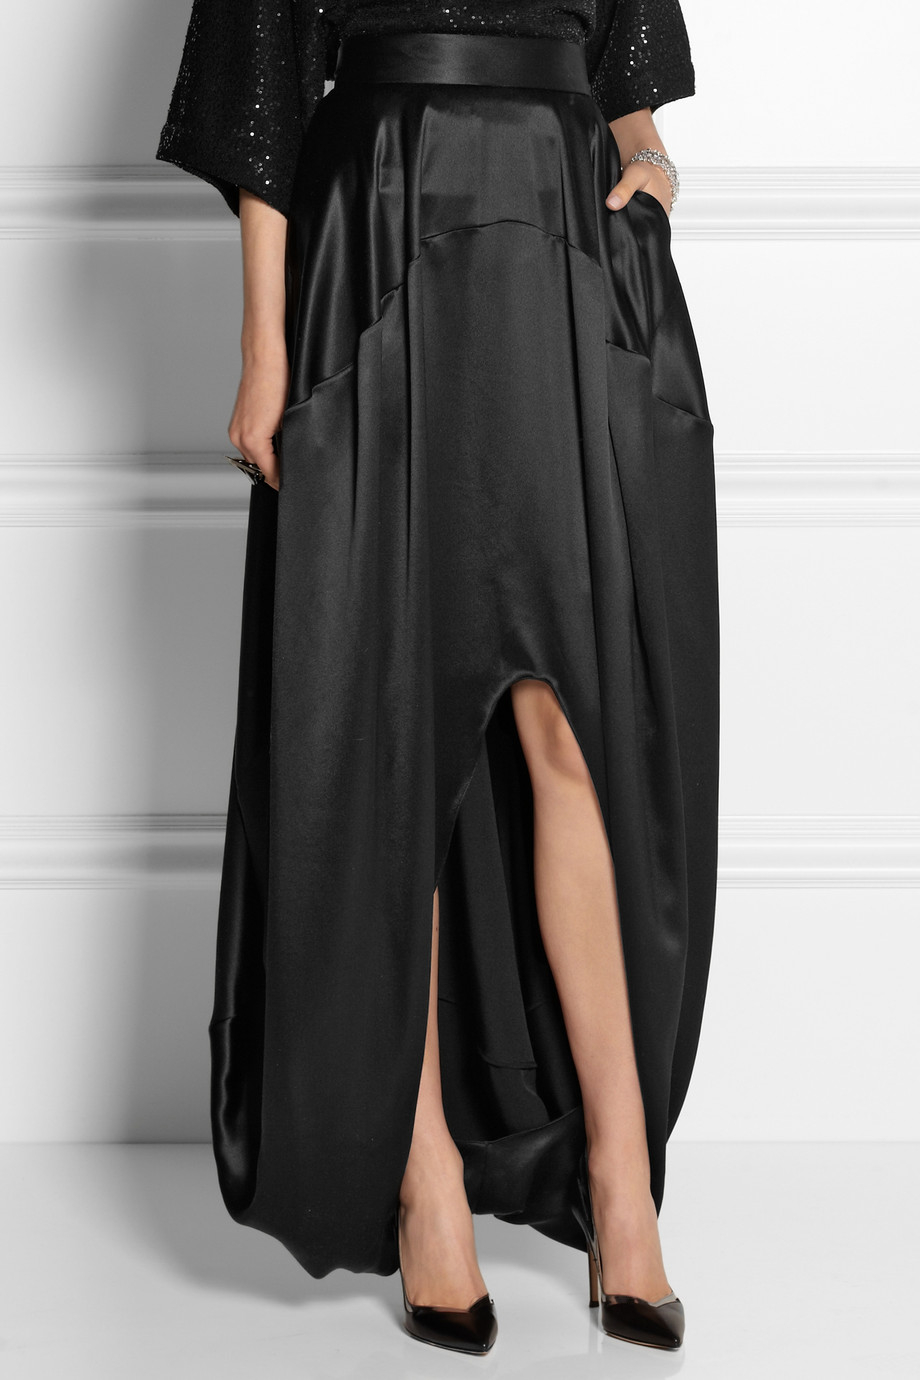 Oscar de la renta Silk-Satin Maxi Skirt in Black | Lyst